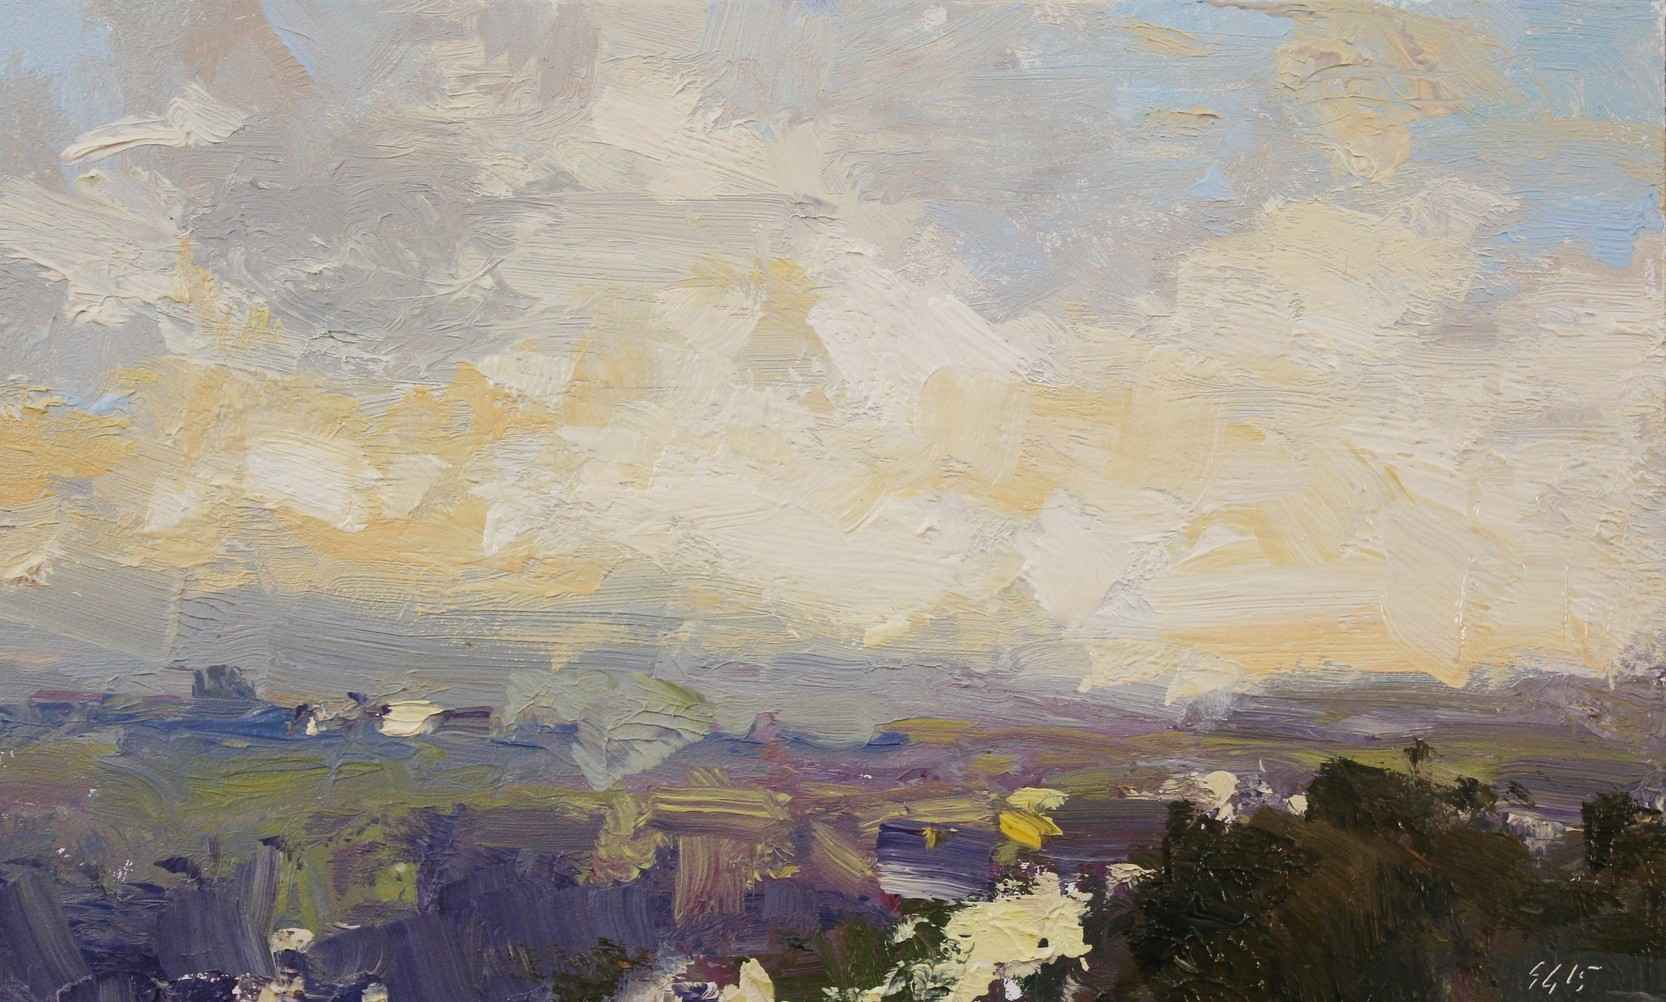 Morning Clouds by  Scott Gellatly - Masterpiece Online